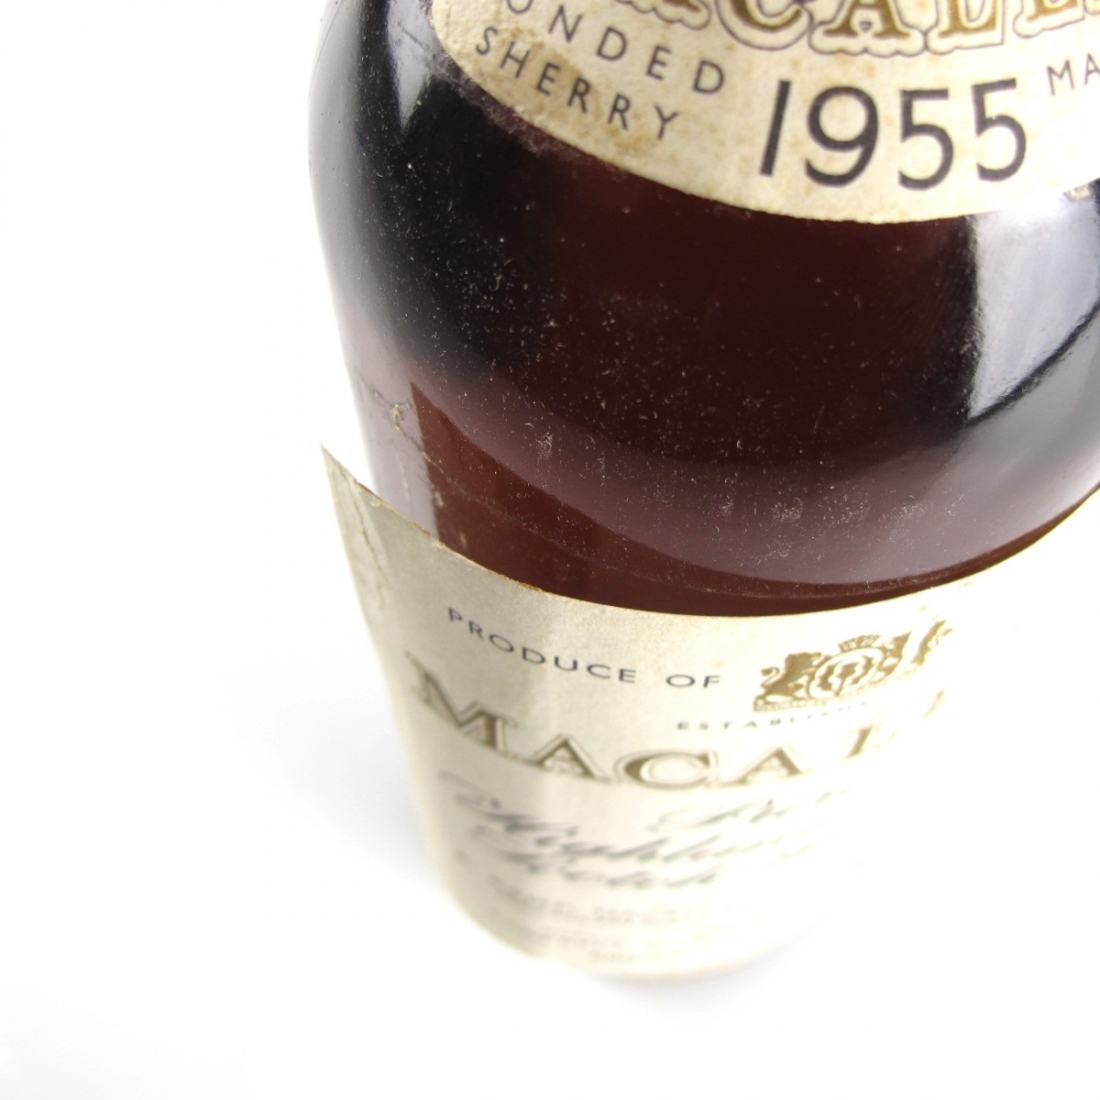 Macallan 1955 Campbell, Hope and King / Rinaldi Import